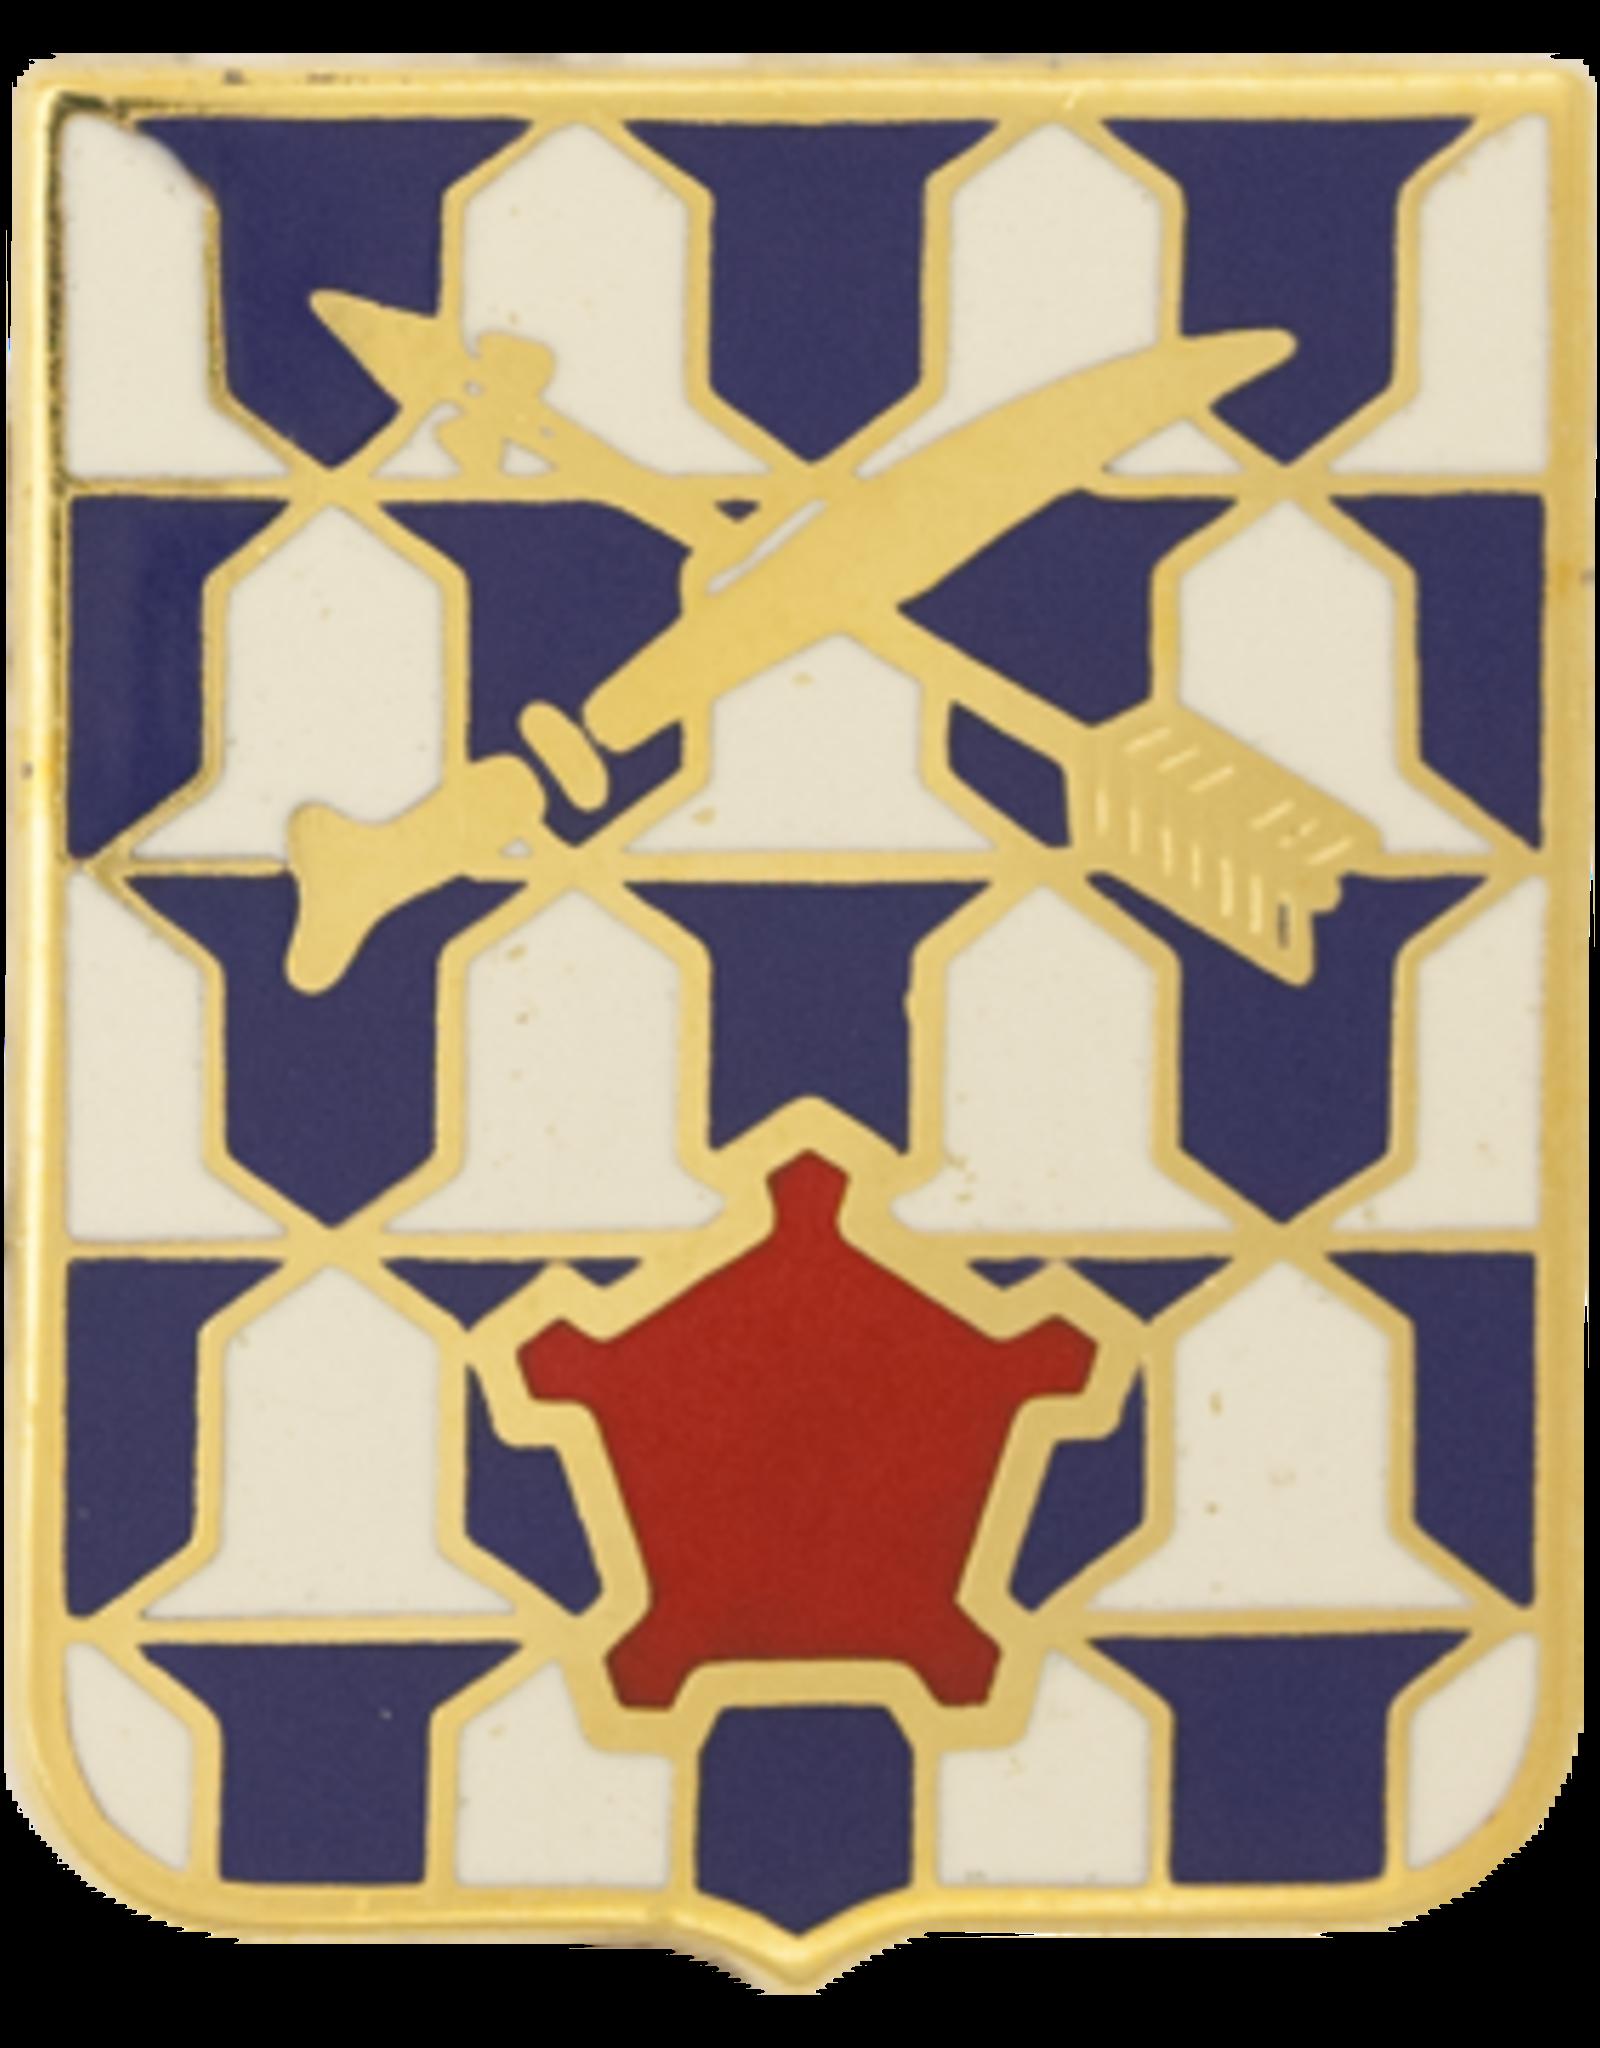 16th Infantry Crest